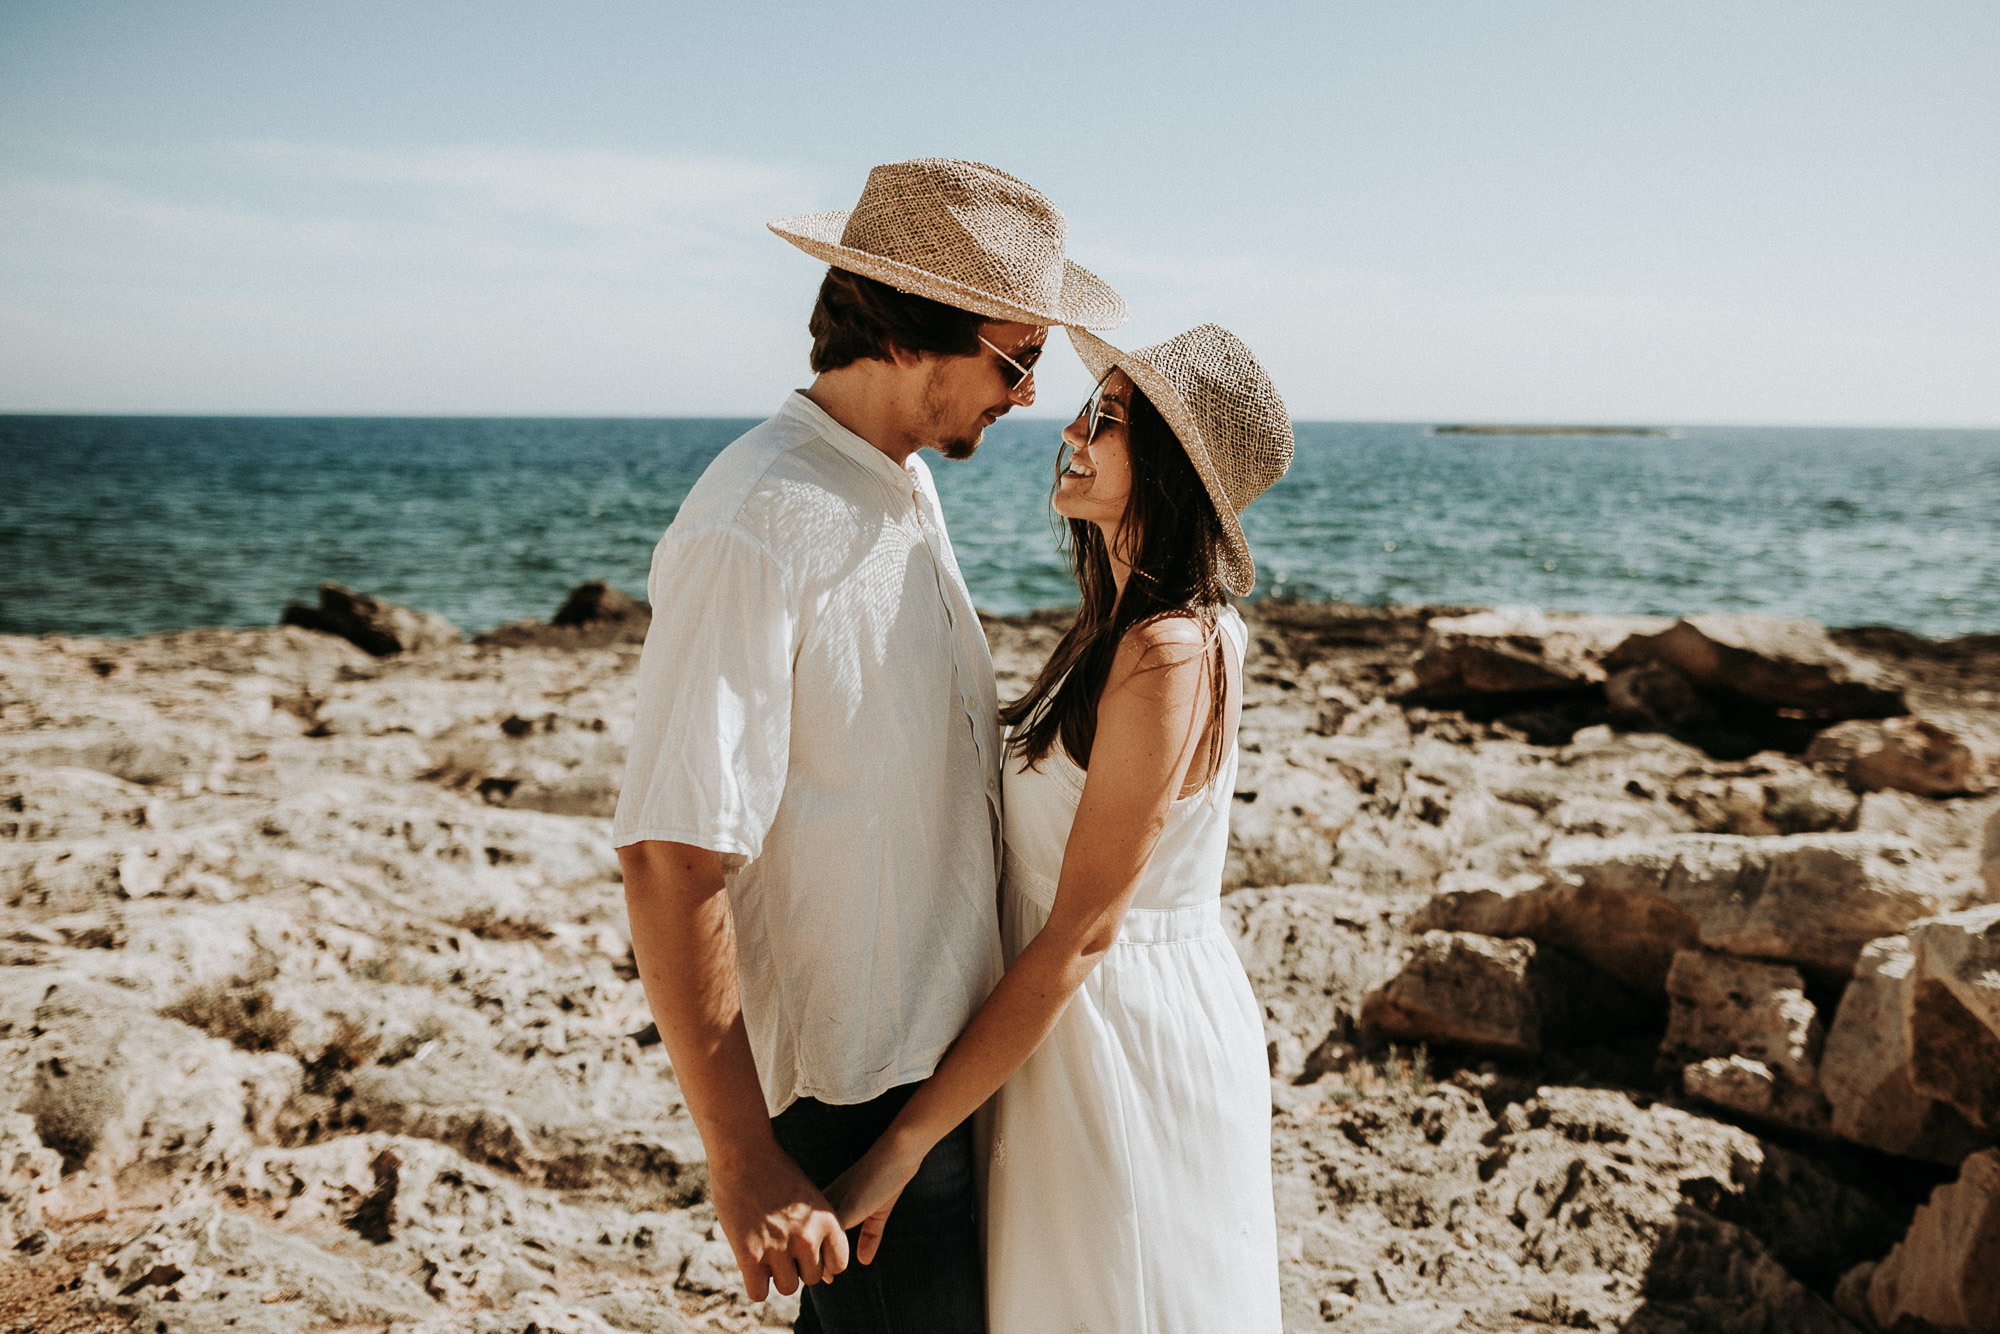 DanielaMarquardtPhotography_wedding_elopement_mallorca_spain_stjordi_sessalines_marinaandxavi323